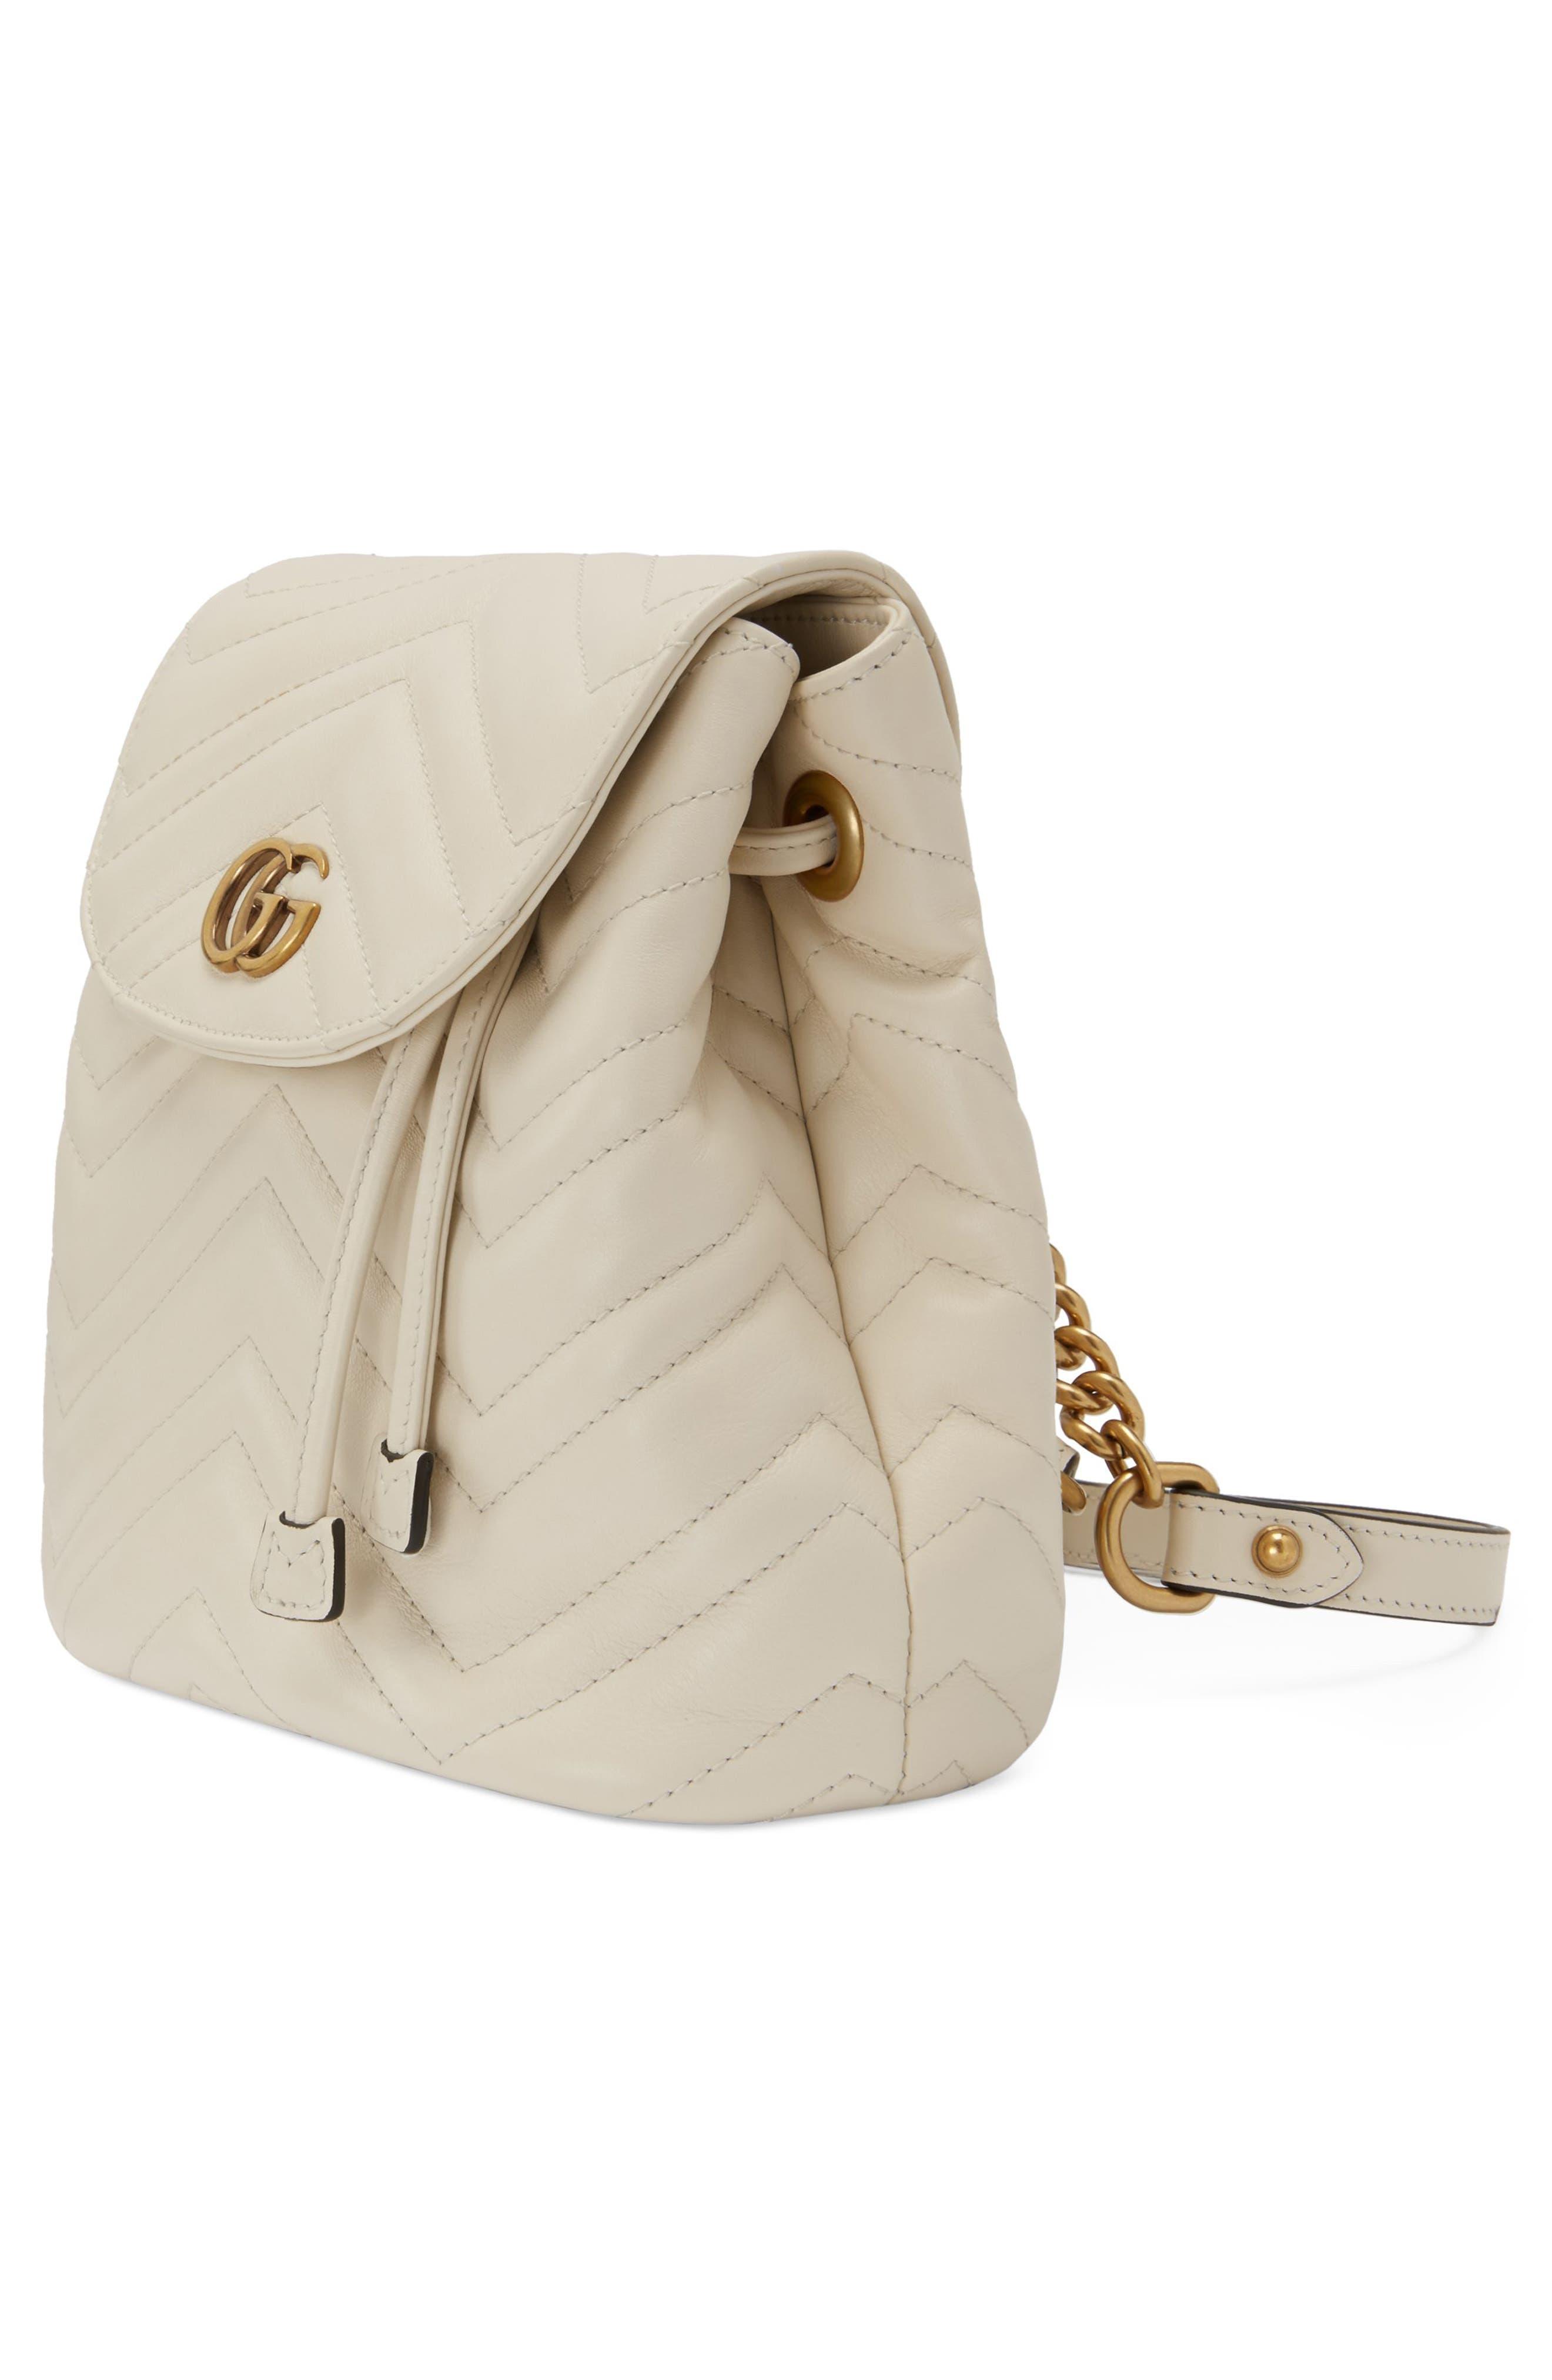 GUCCI,                             GG Marmont 2.0 Matelassé Leather Mini Backpack,                             Alternate thumbnail 4, color,                             MYSTIC WHITE